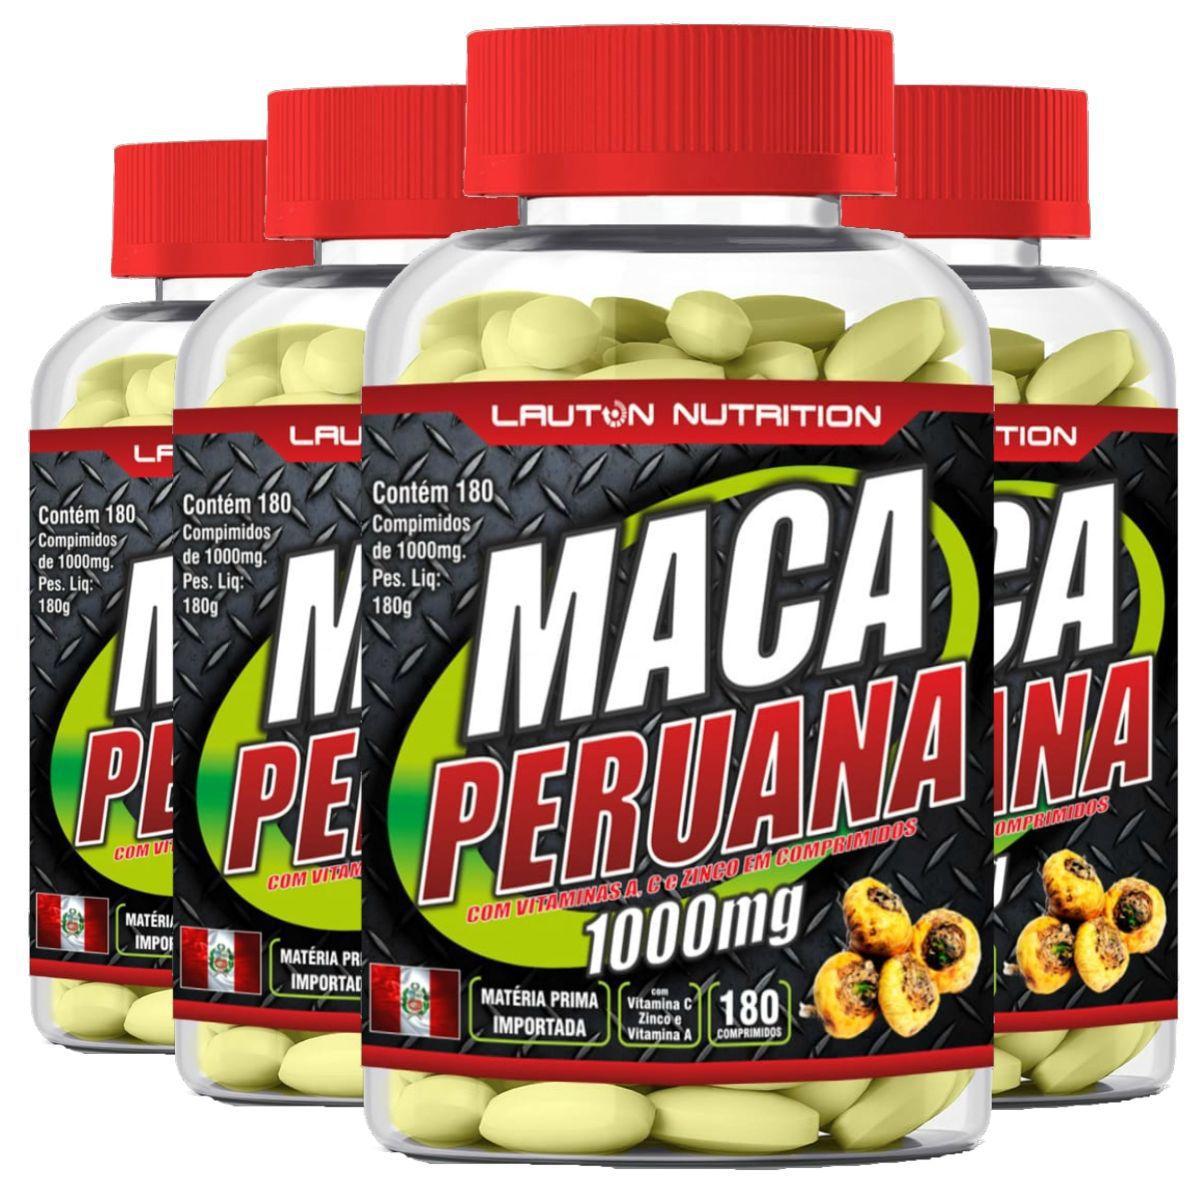 Kit 4 Maca Peruana 180 Tabs 1000mg - Lauton Nutrition